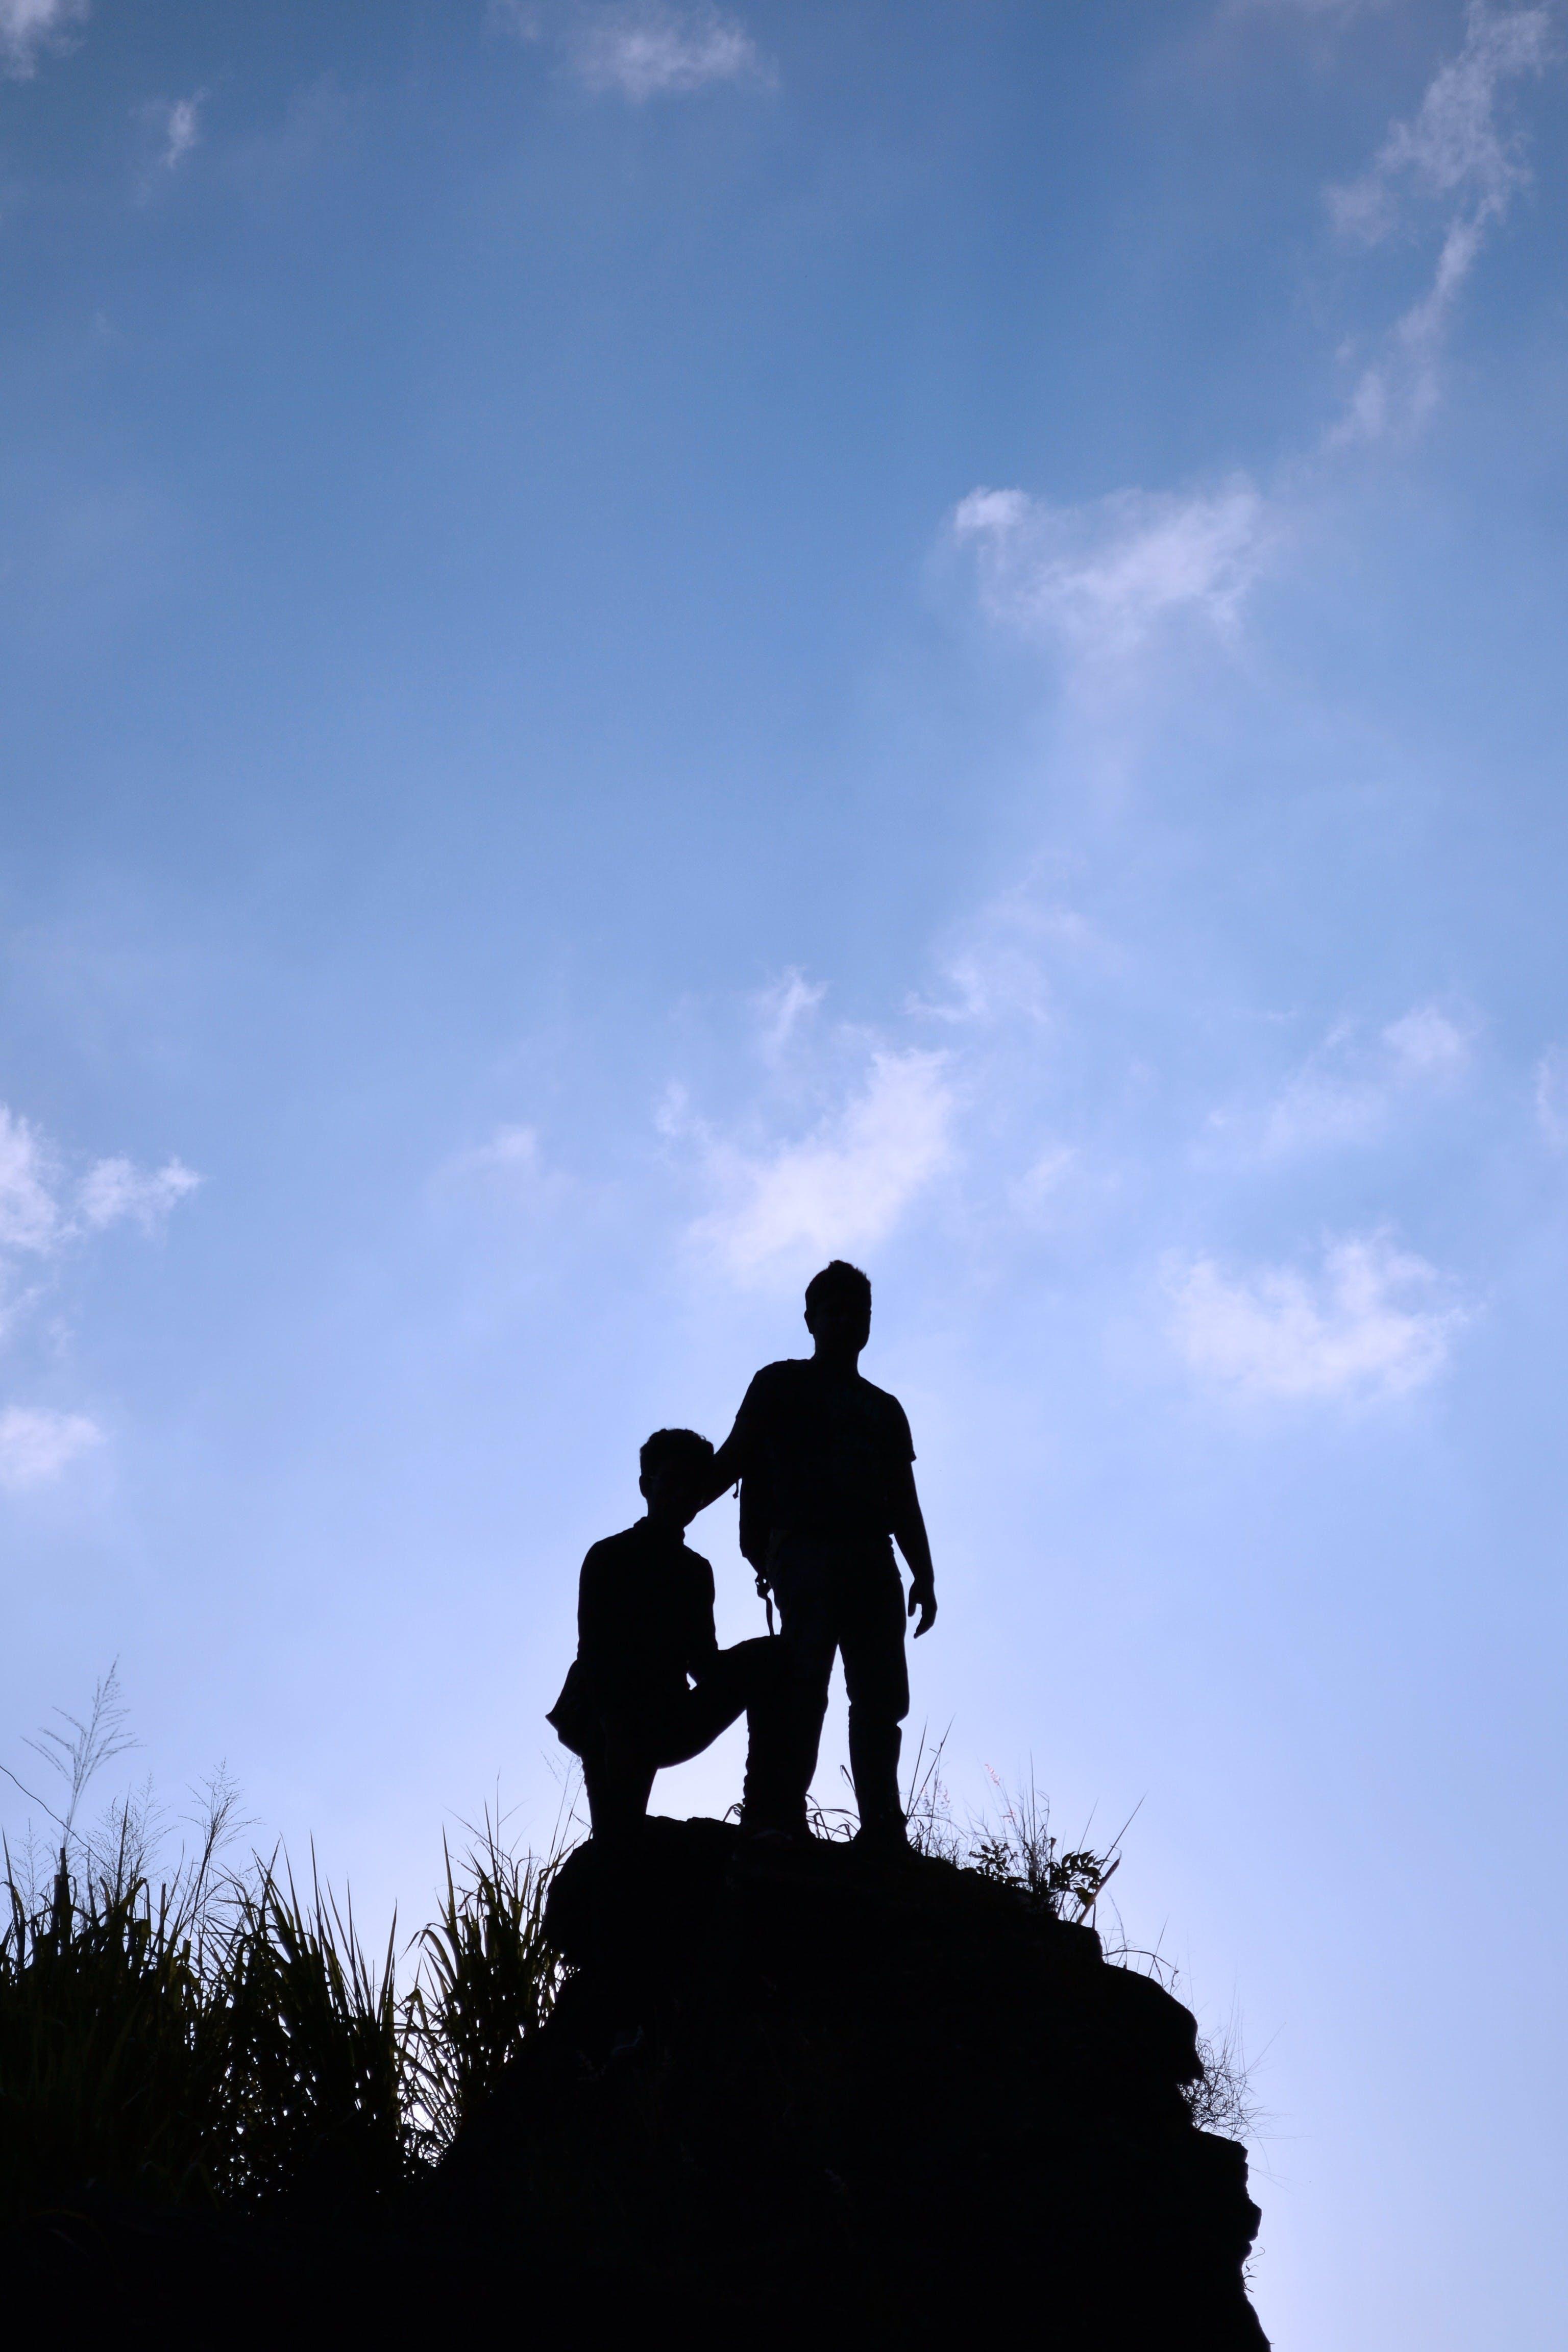 Free stock photo of sky, people, silhouette, blue sky